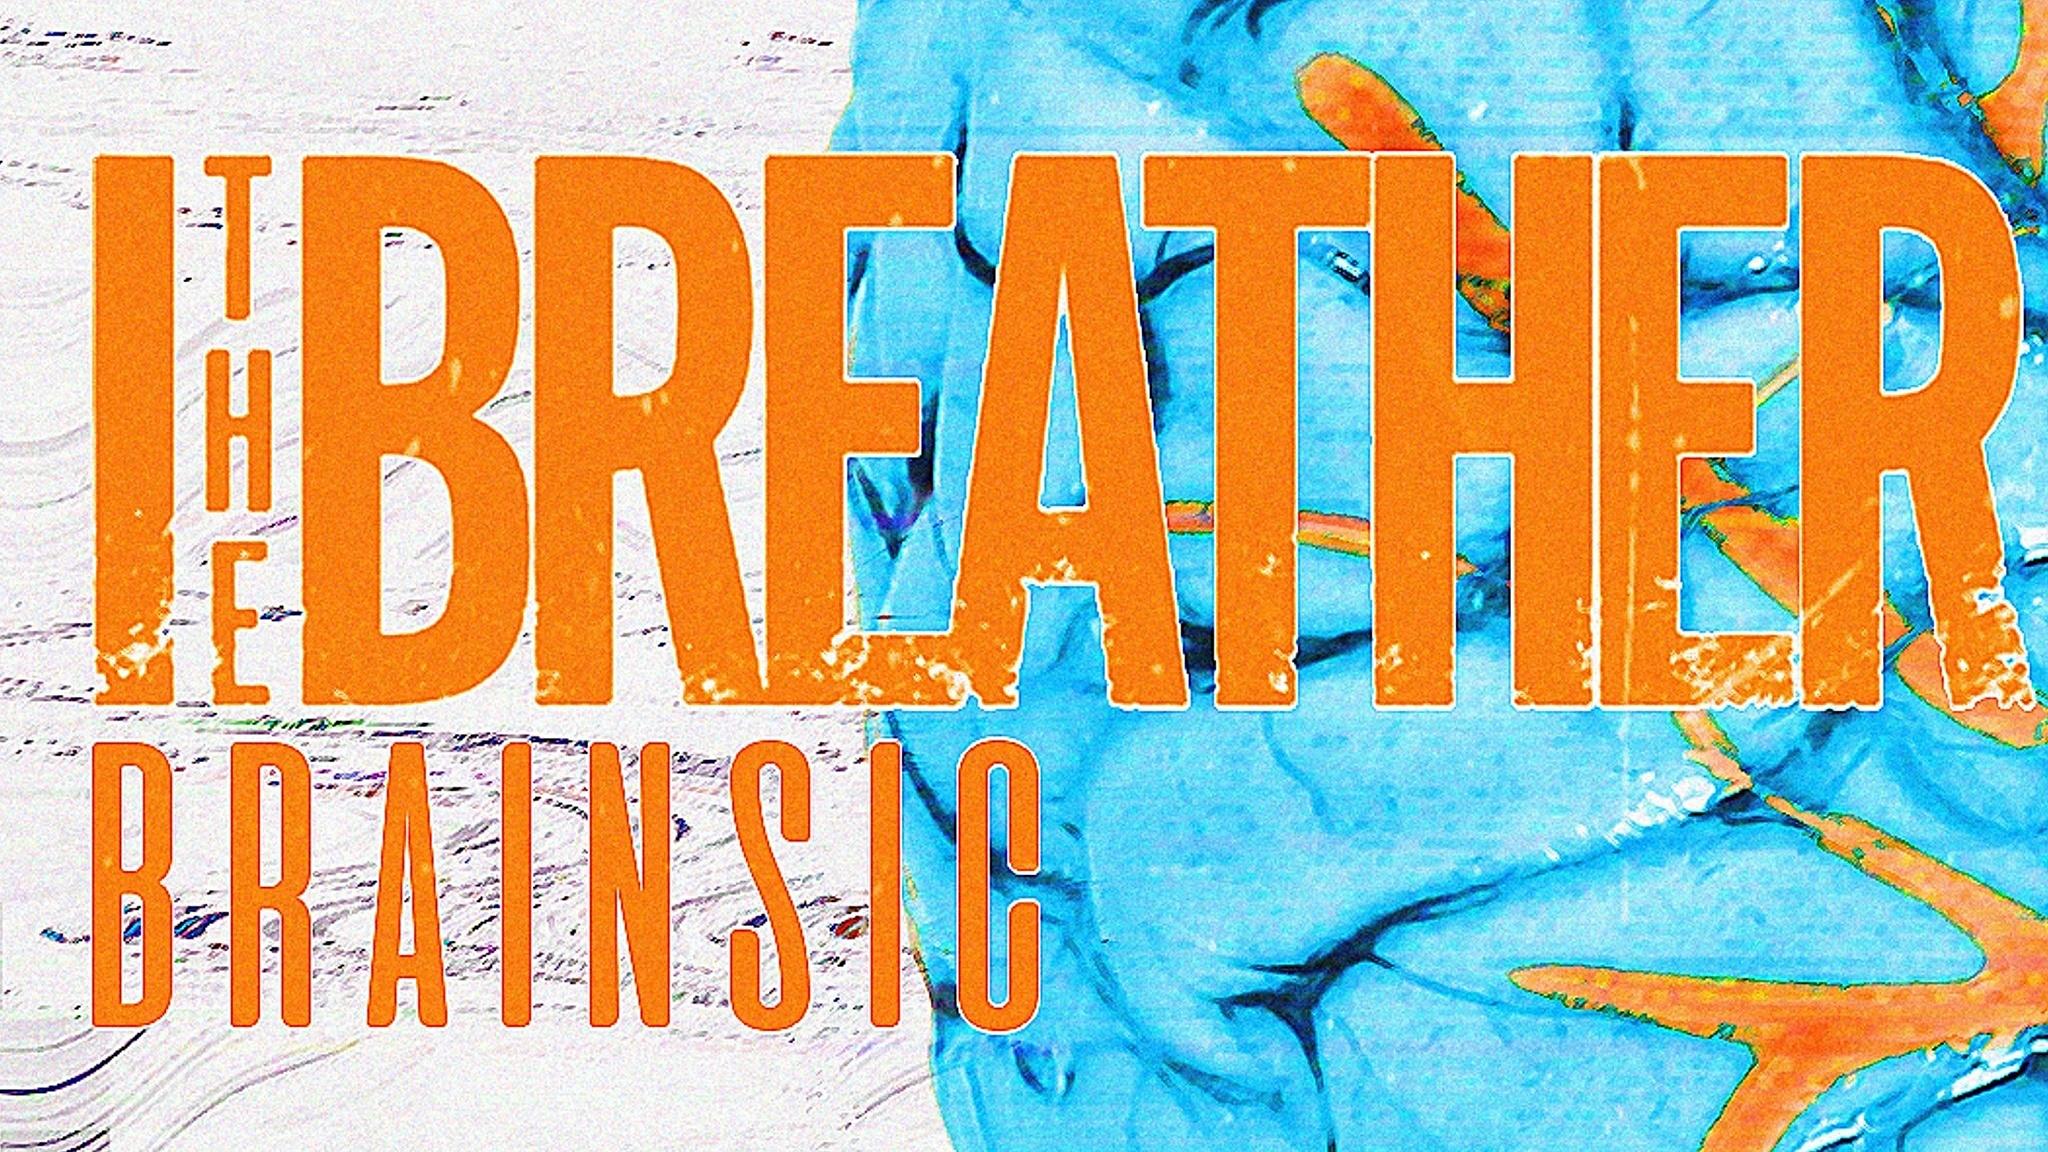 I, The Breather Brainsic